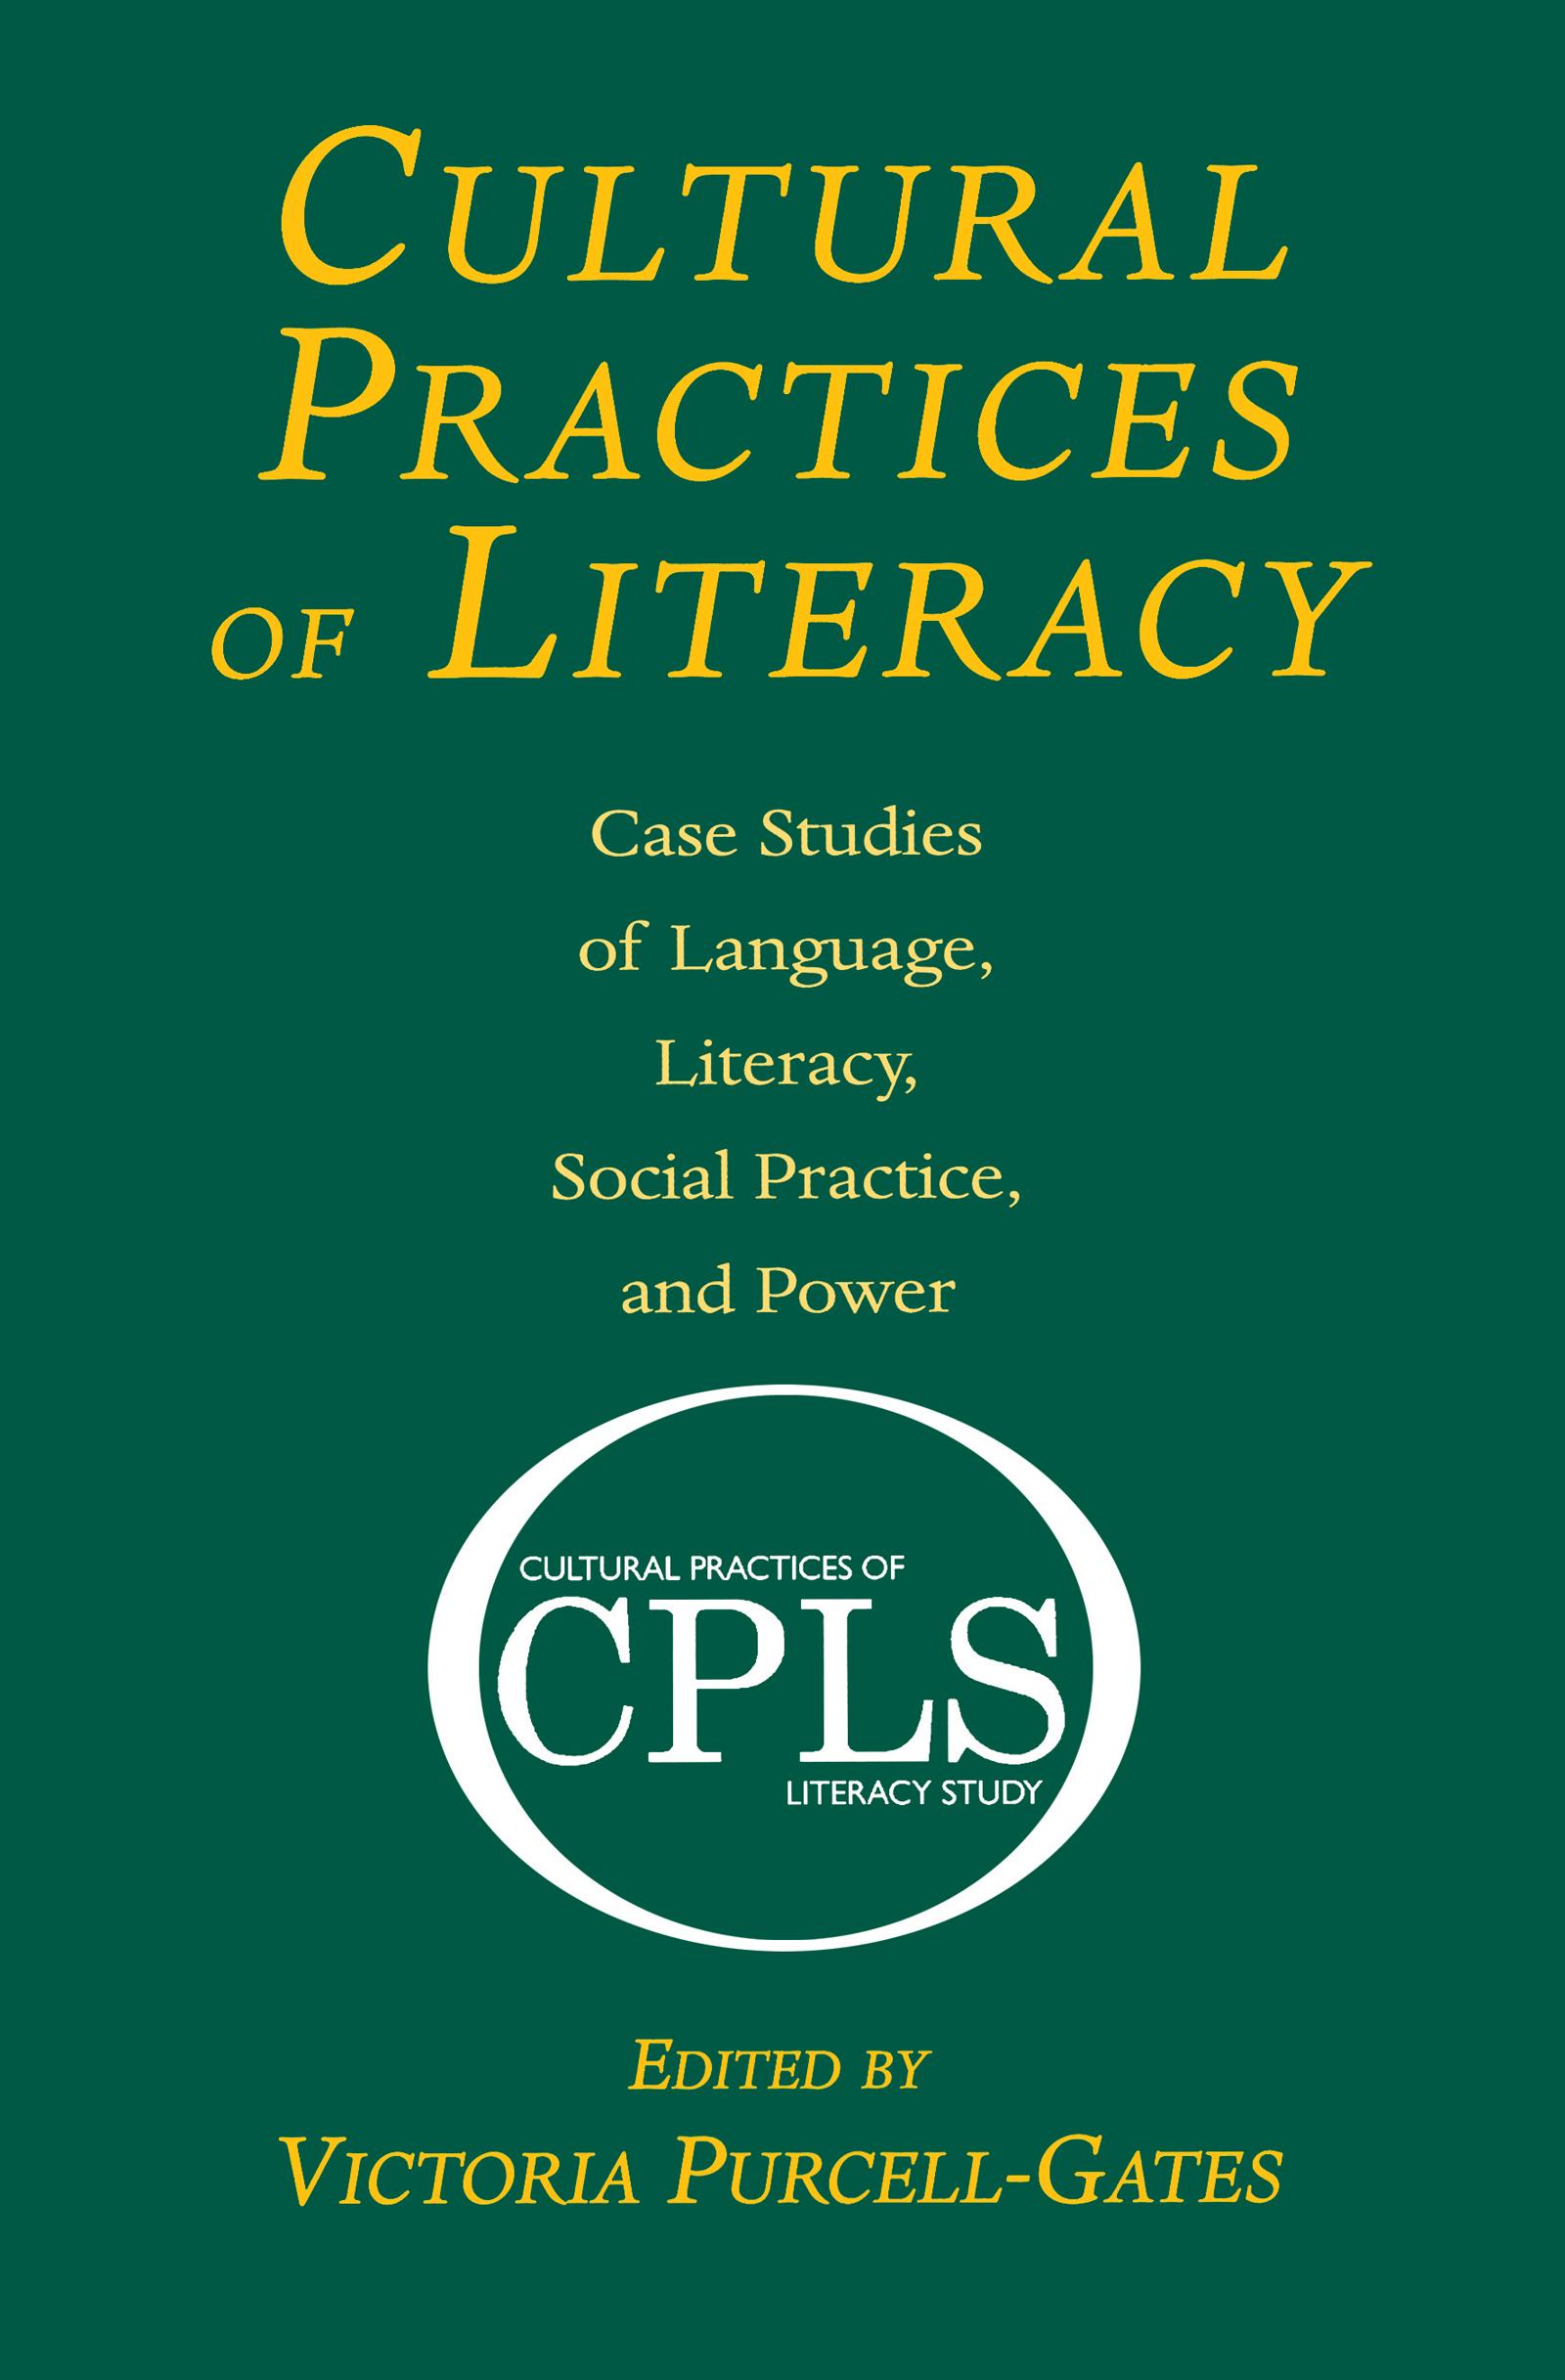 Digital Literac(ies), Digital Discourses, and Communities of Practice: Literacy Practices in Virtual Environments